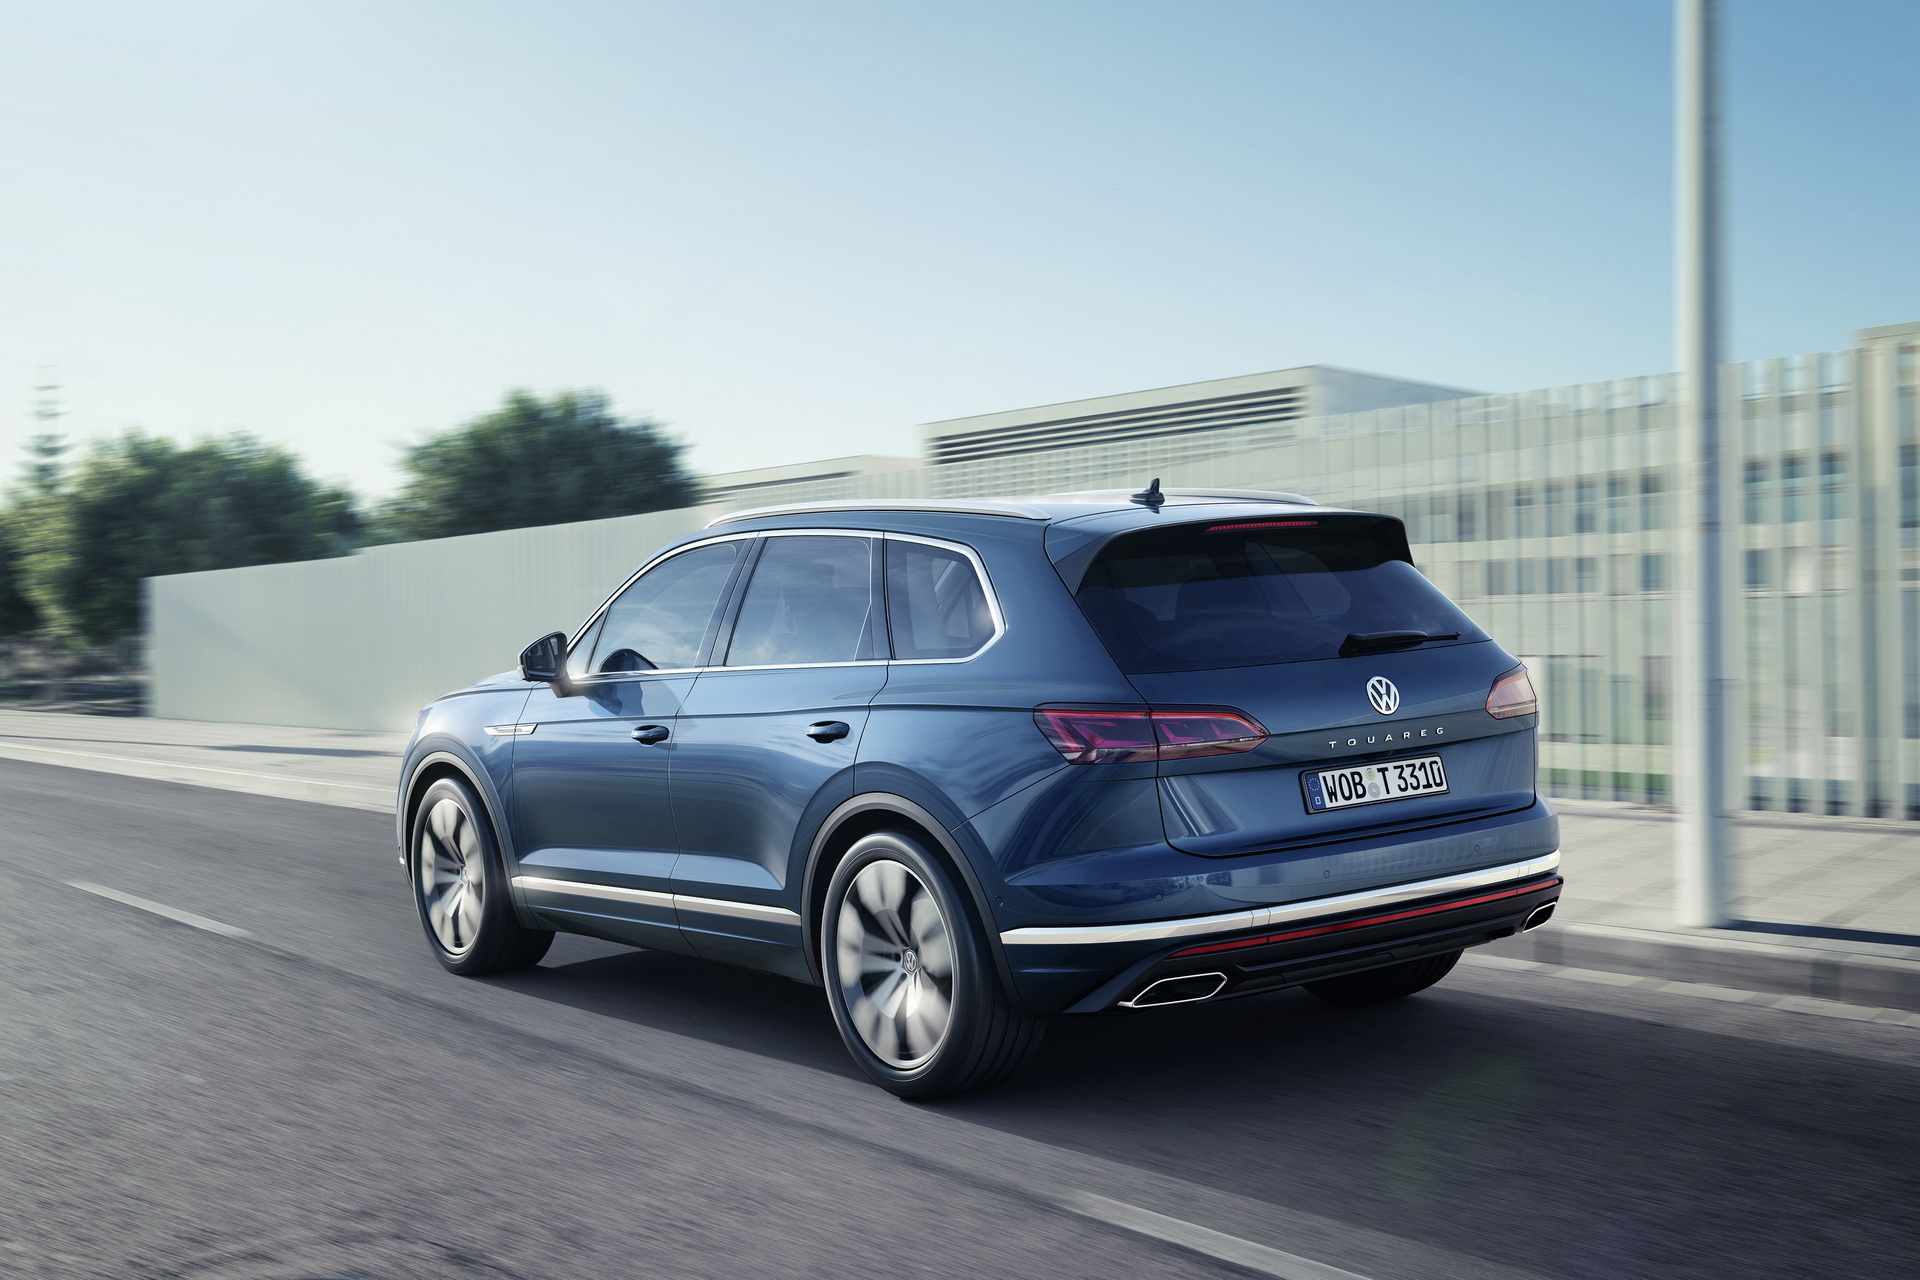 Volkswagen Touareg 2018 (16)